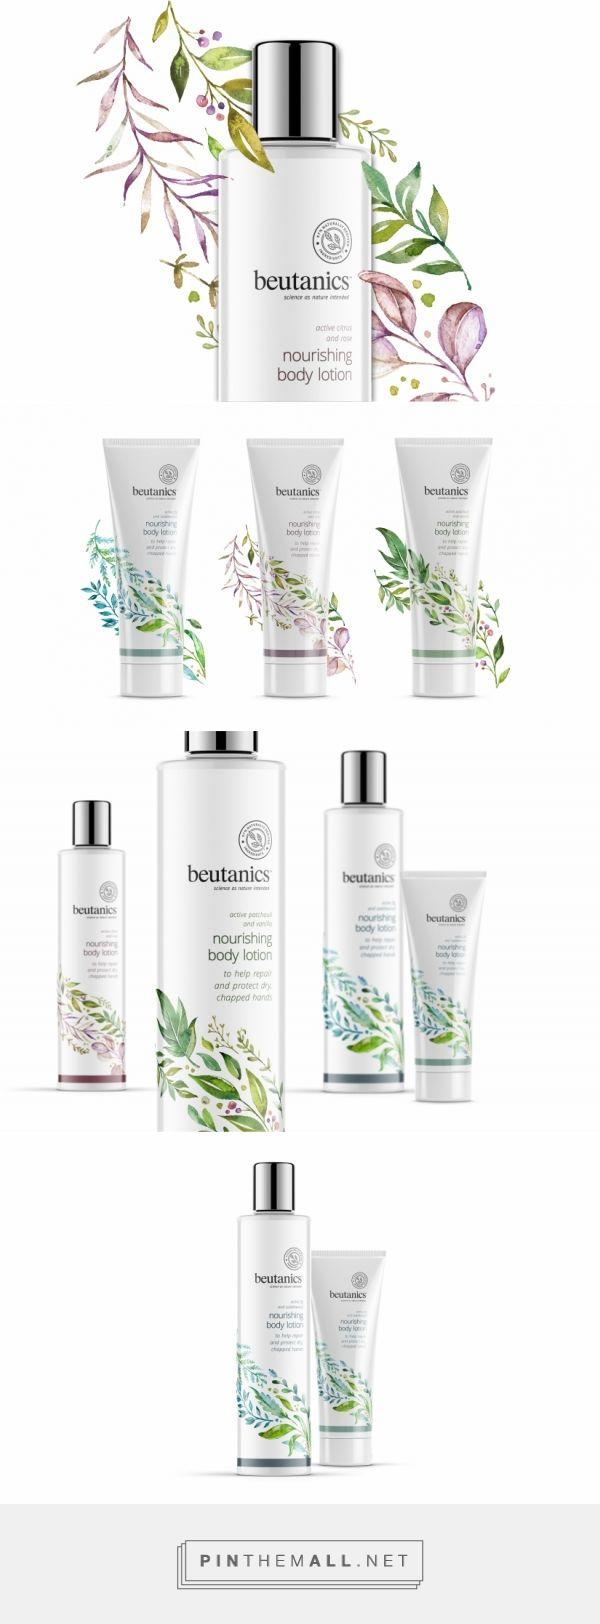 Beutanics (Concept) - Packaging of the World - Creative Package Design Gallery - http://www.packagingoftheworld.com/2017/01/beutanics.html